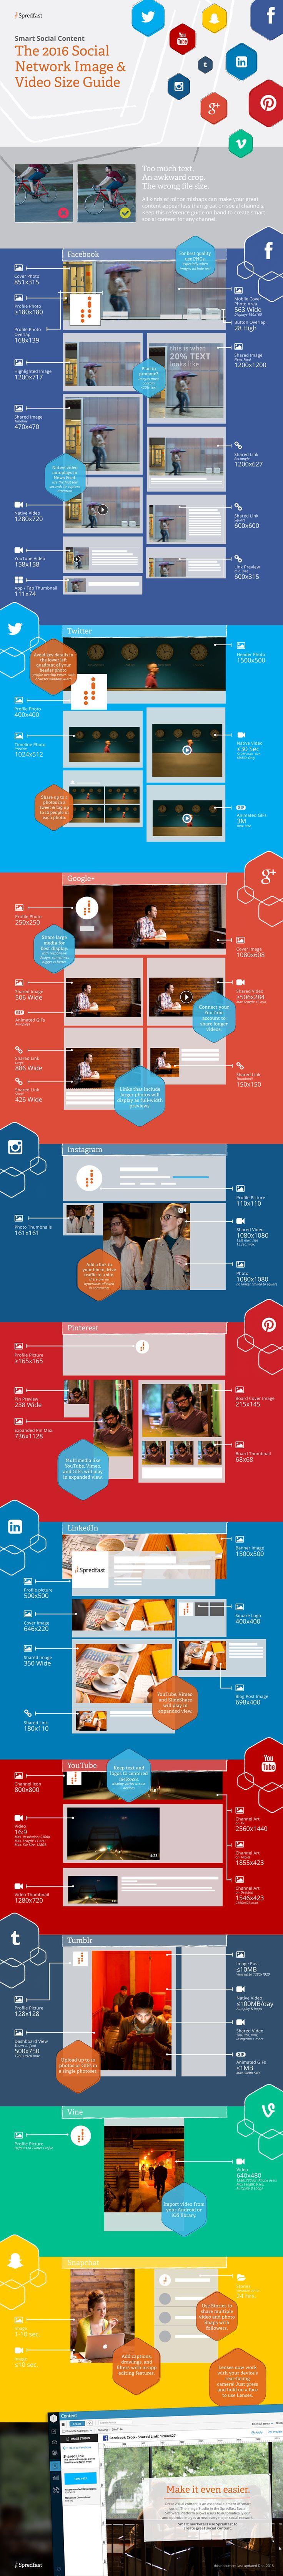 Facebook, Twitter, Instagram, LinkedIn, Pinterest, GooglePlus, Vine, Snapchat, Tumblr  - Up-to-Date Guide to Social Media Image Sizes infographic